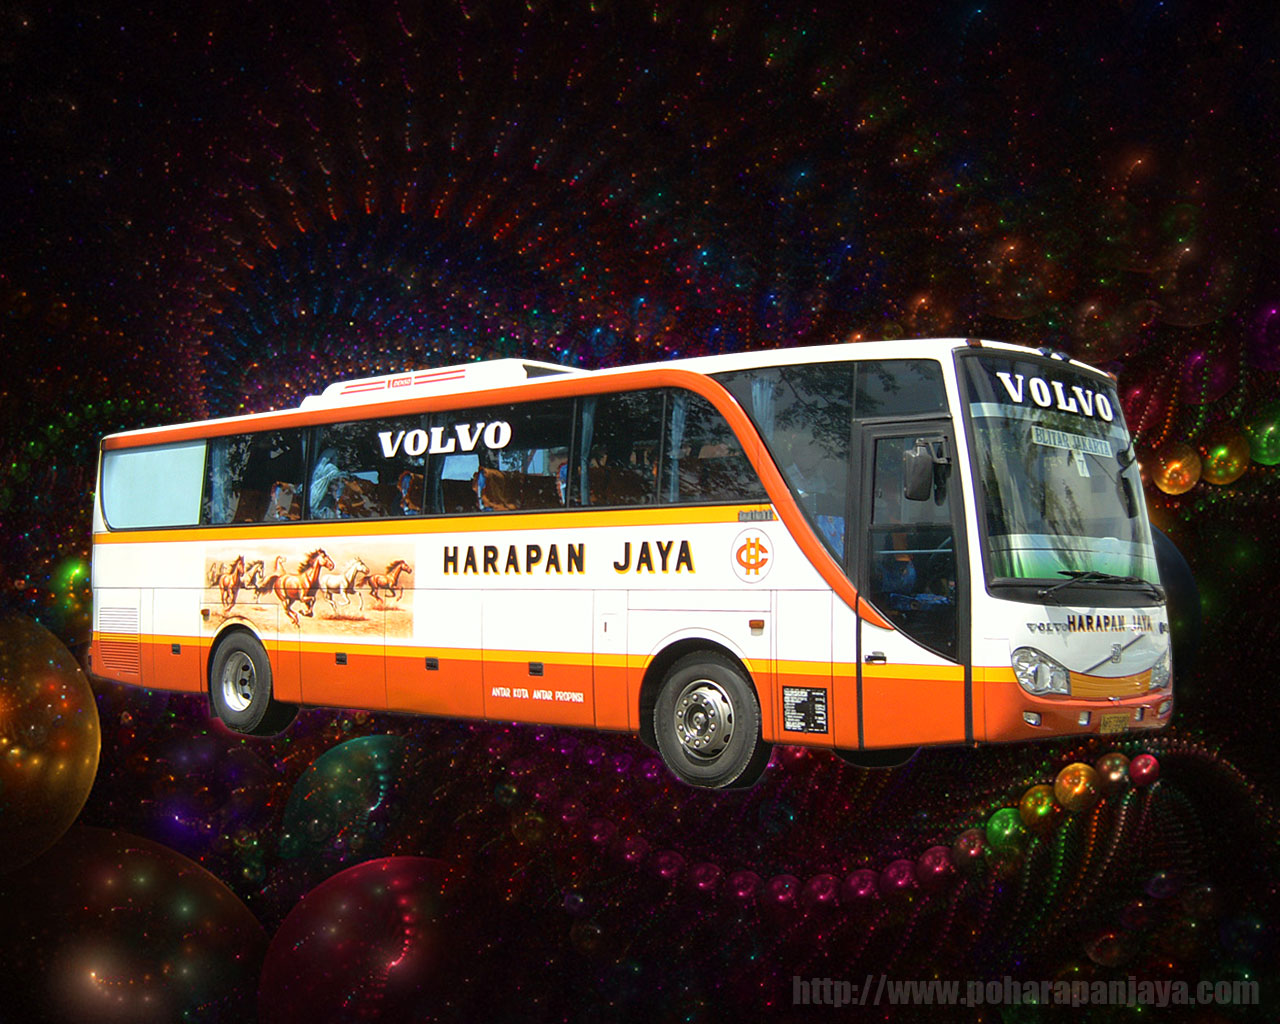 Bus Wallpaper Bus Malam Patas Bus Pariwisata 1280x1024